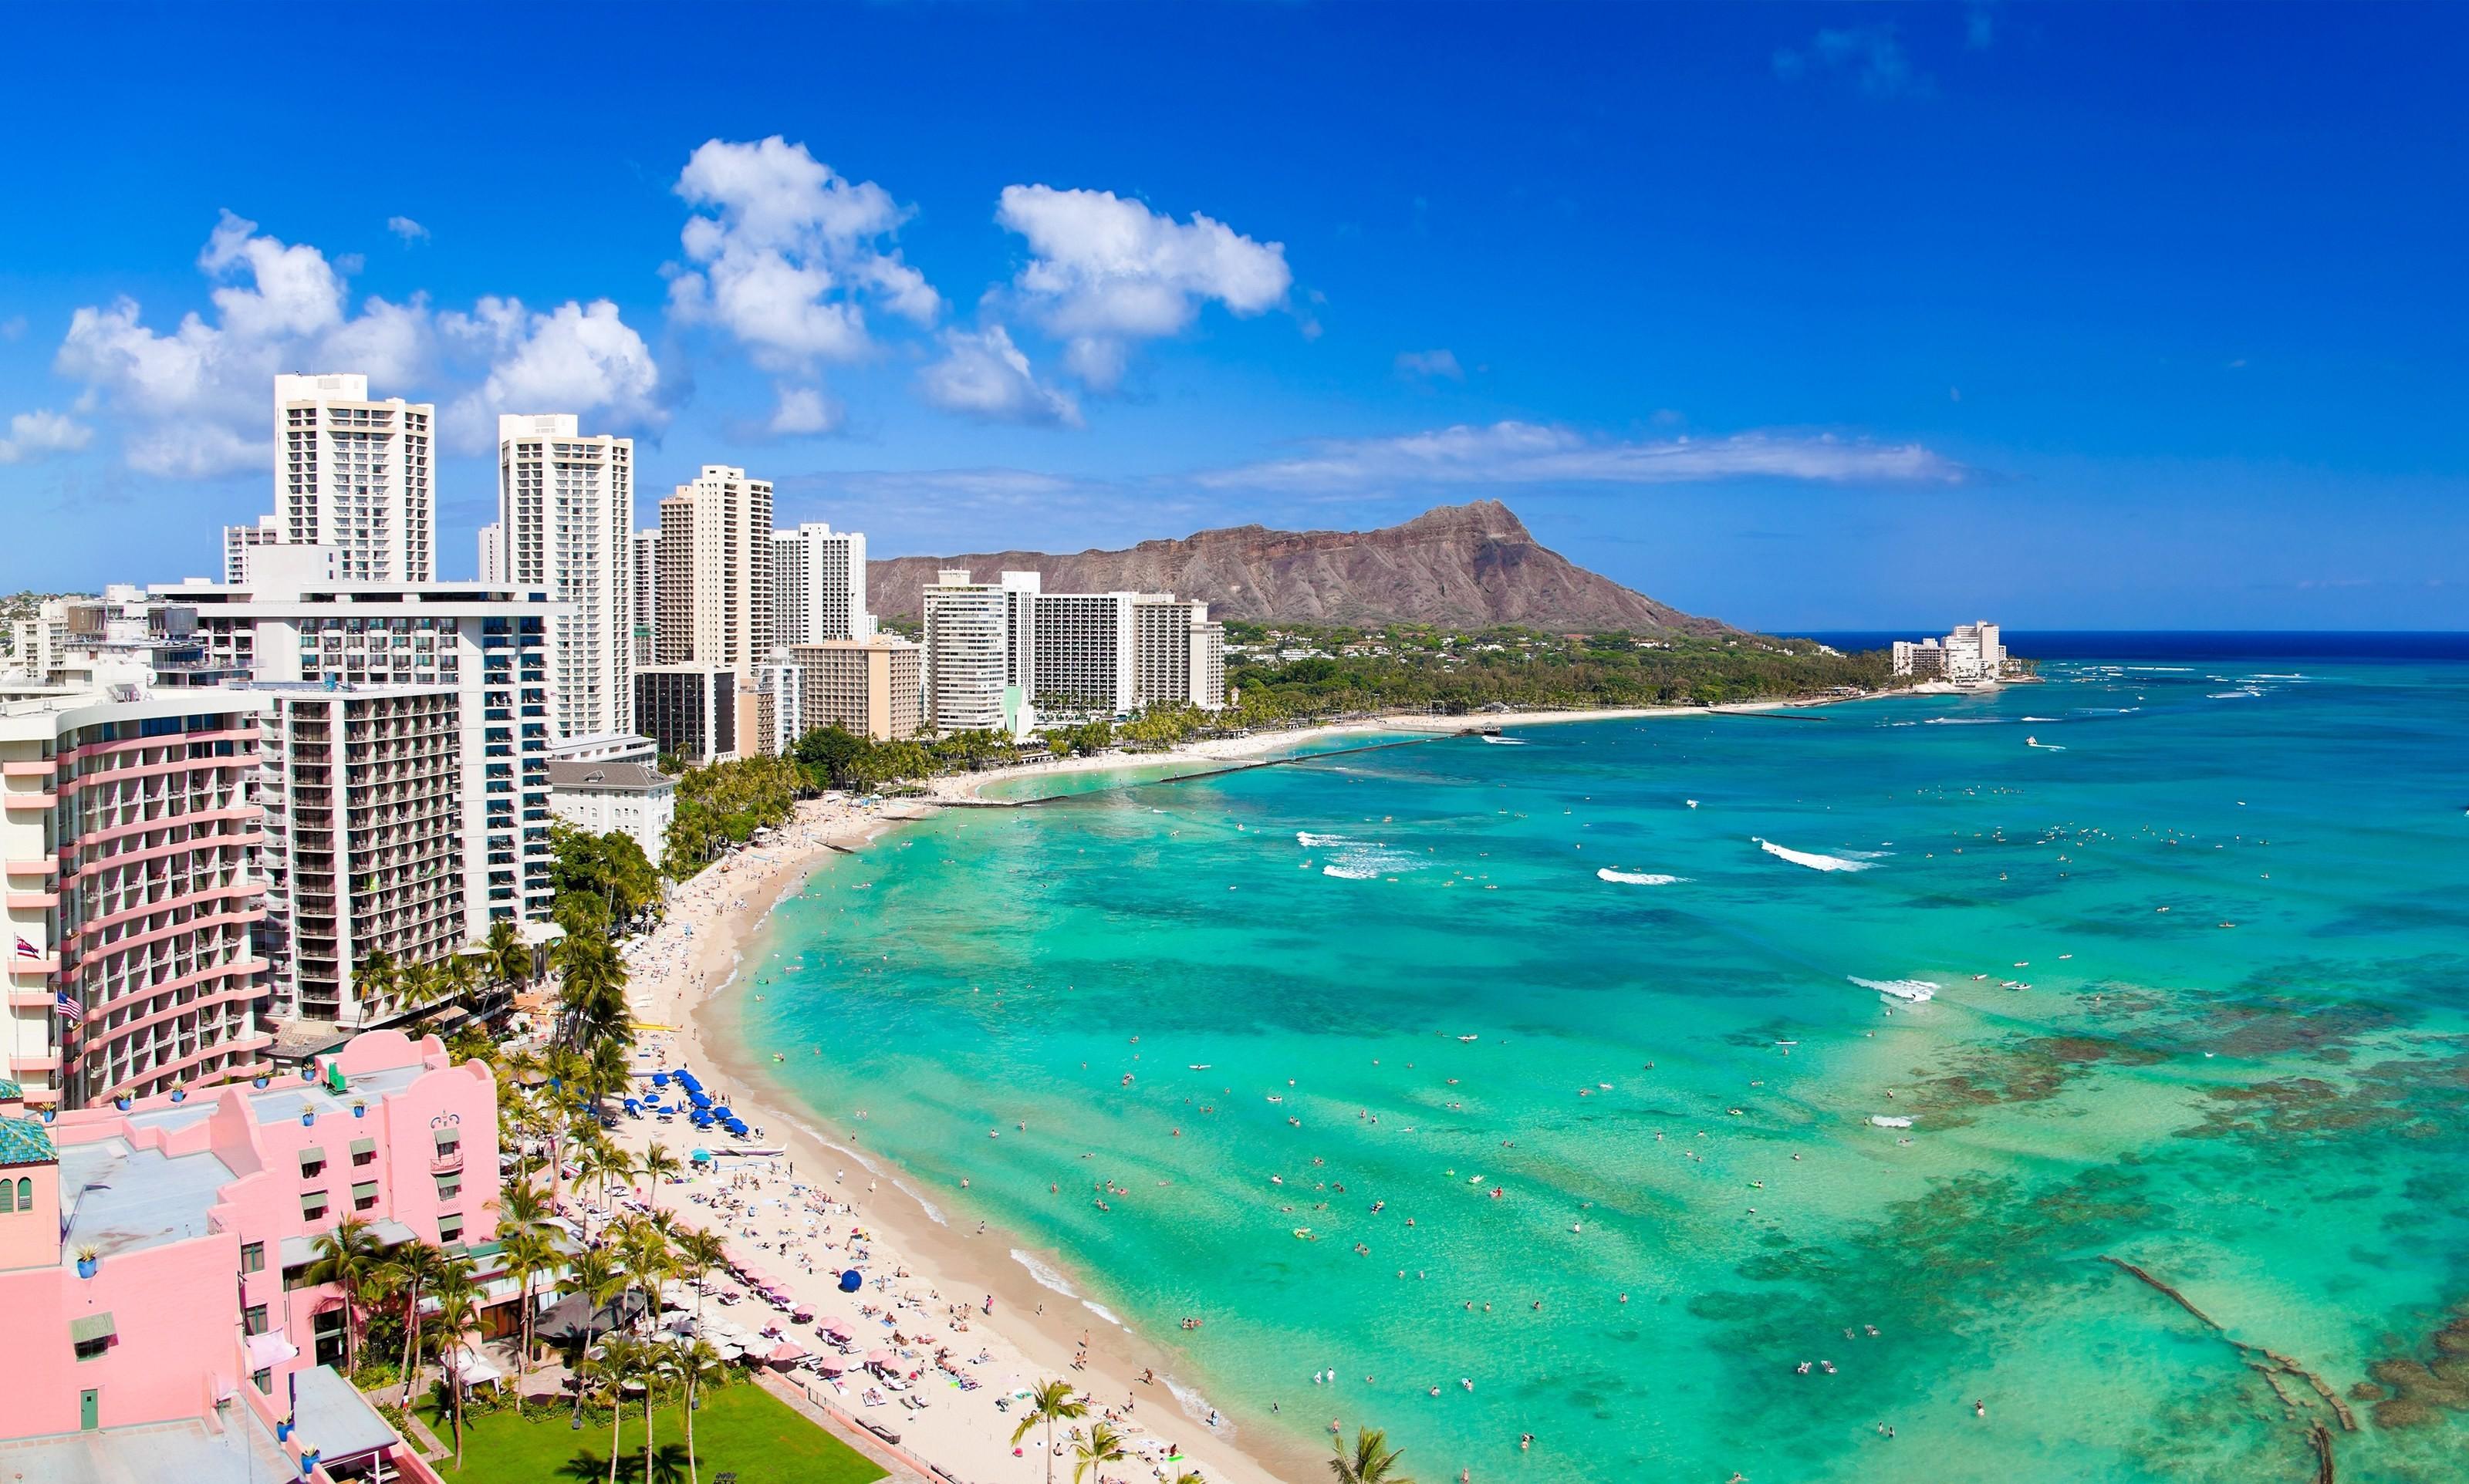 61 Waikiki Beach Wallpapers on WallpaperPlay 3200x1924